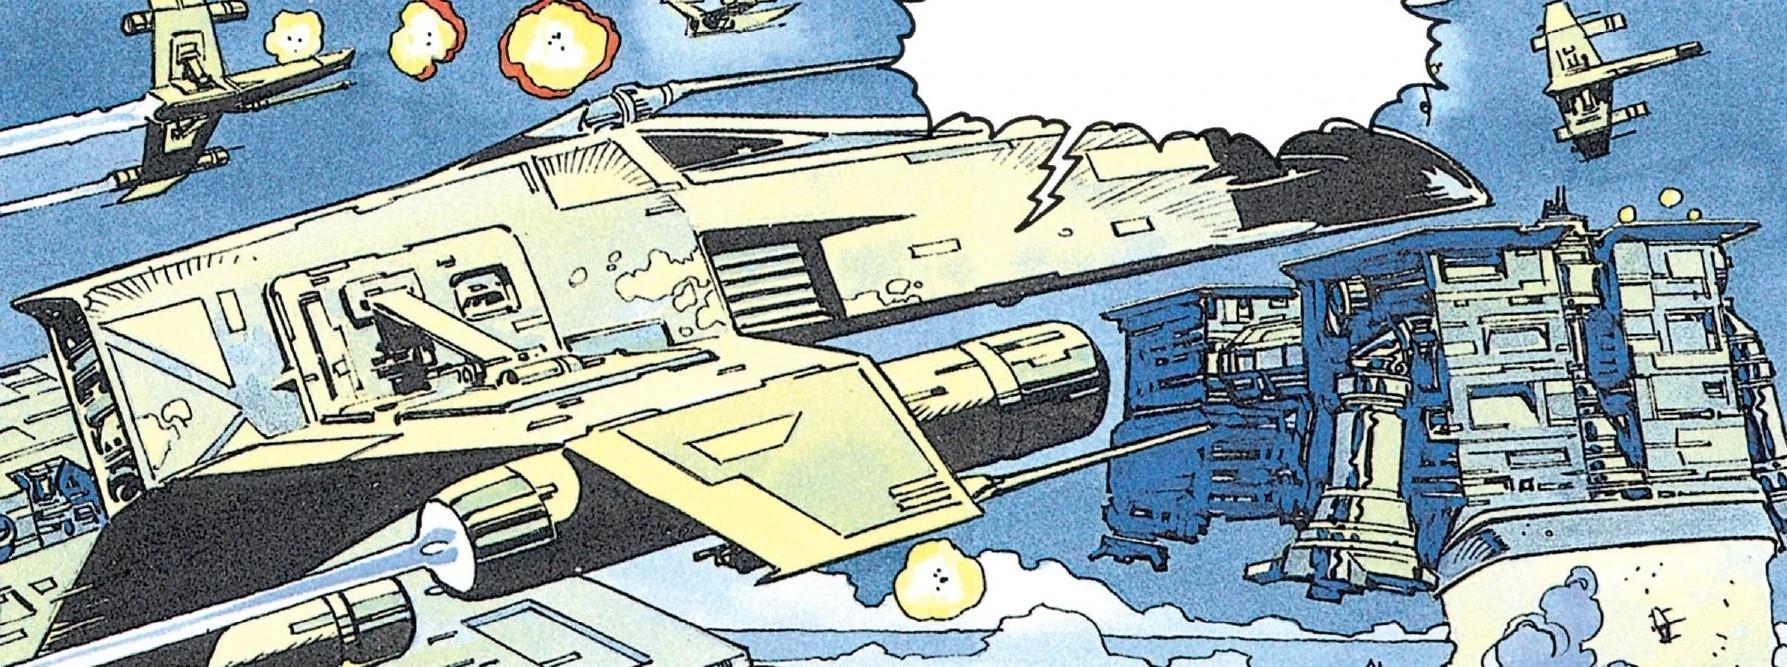 Archivo:Ewingfighter.jpg